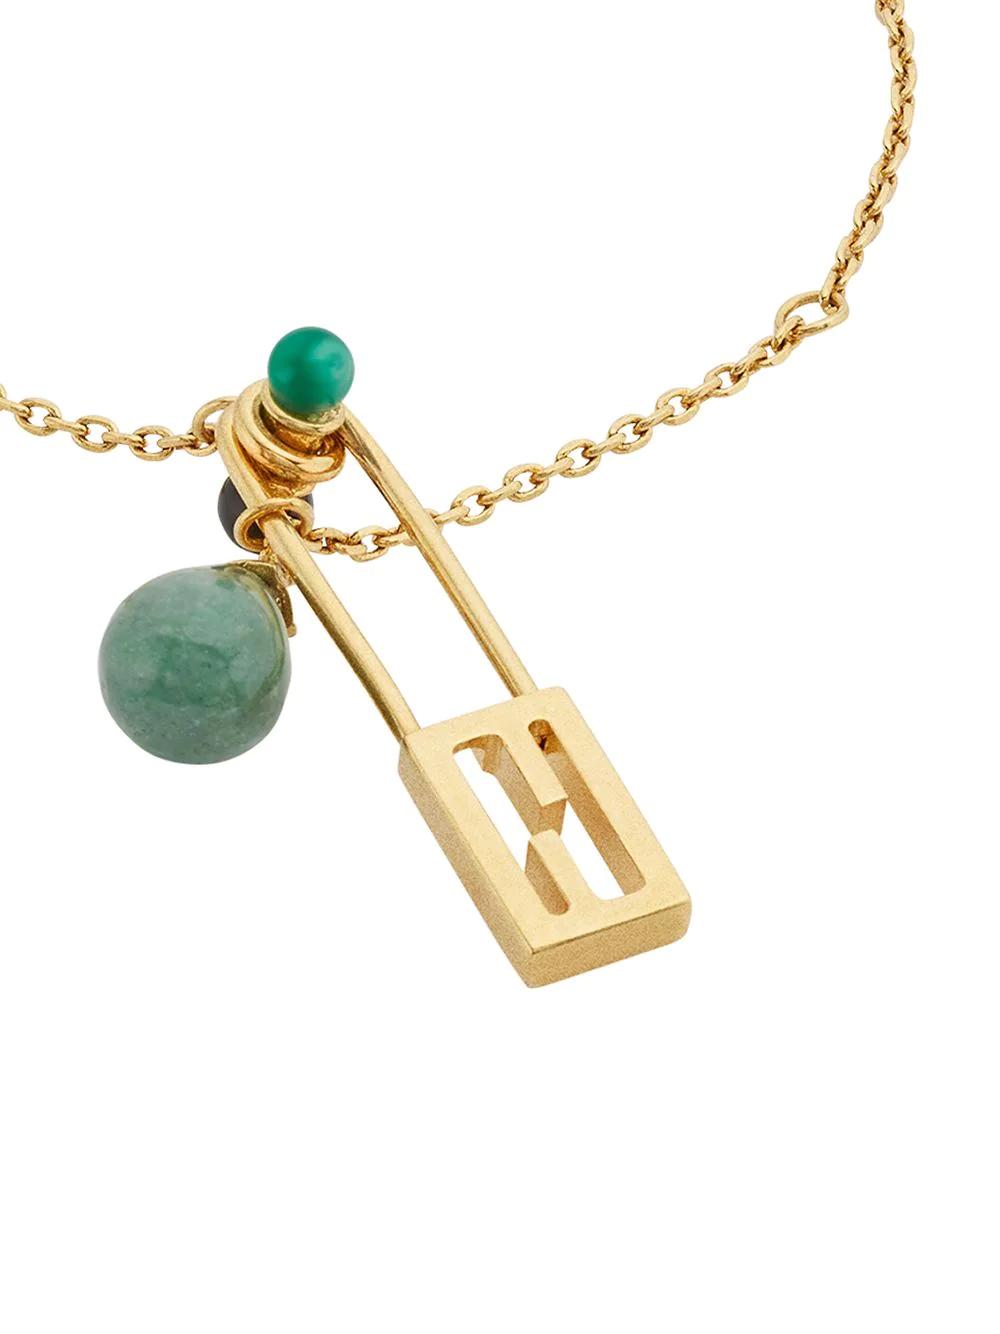 FENDI | Fendi цепочный браслет с подвеской в виде булавки | Clouty